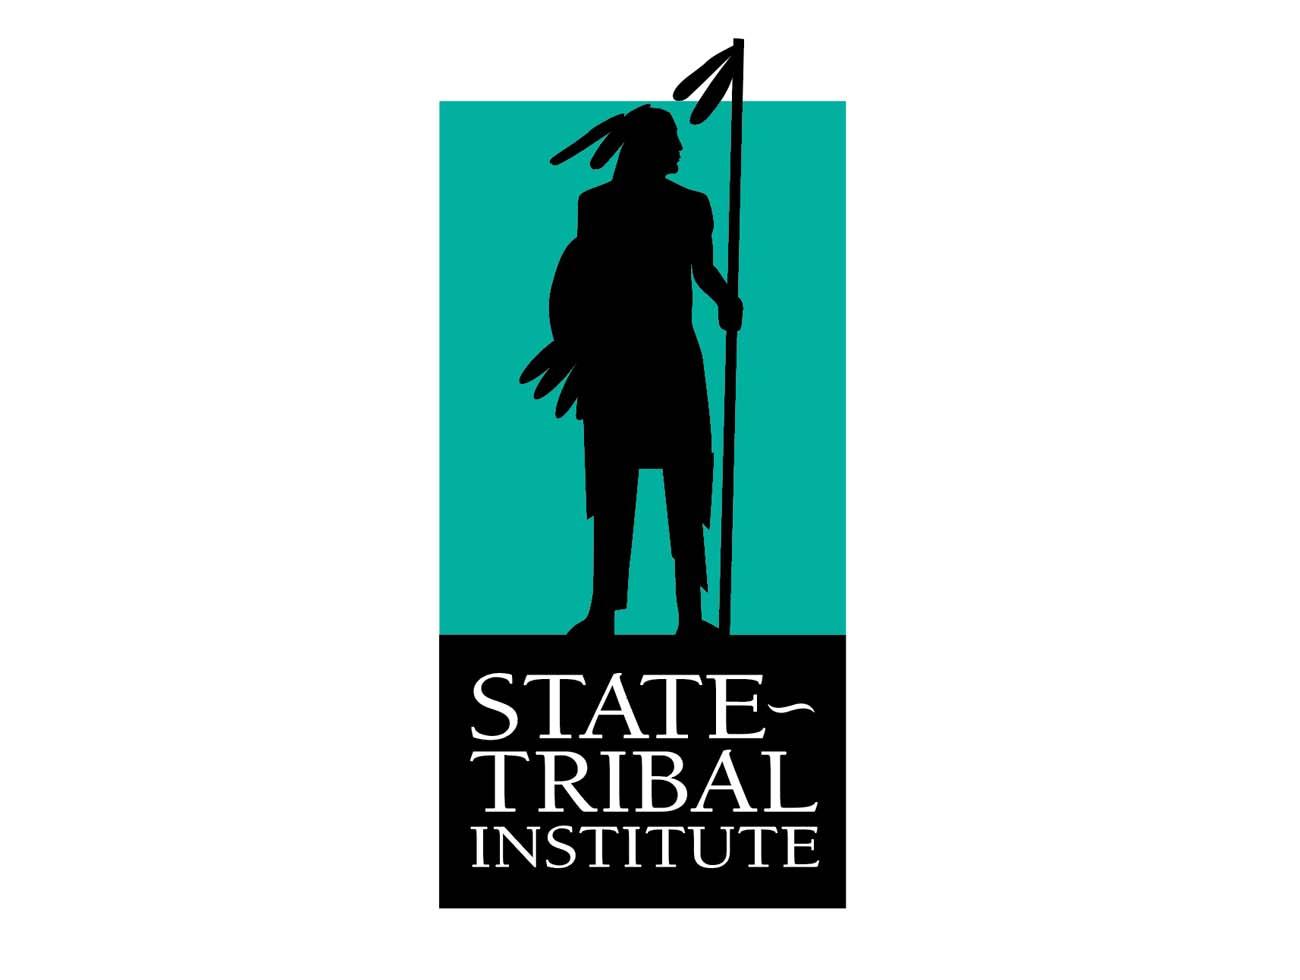 State-Tribal Institute